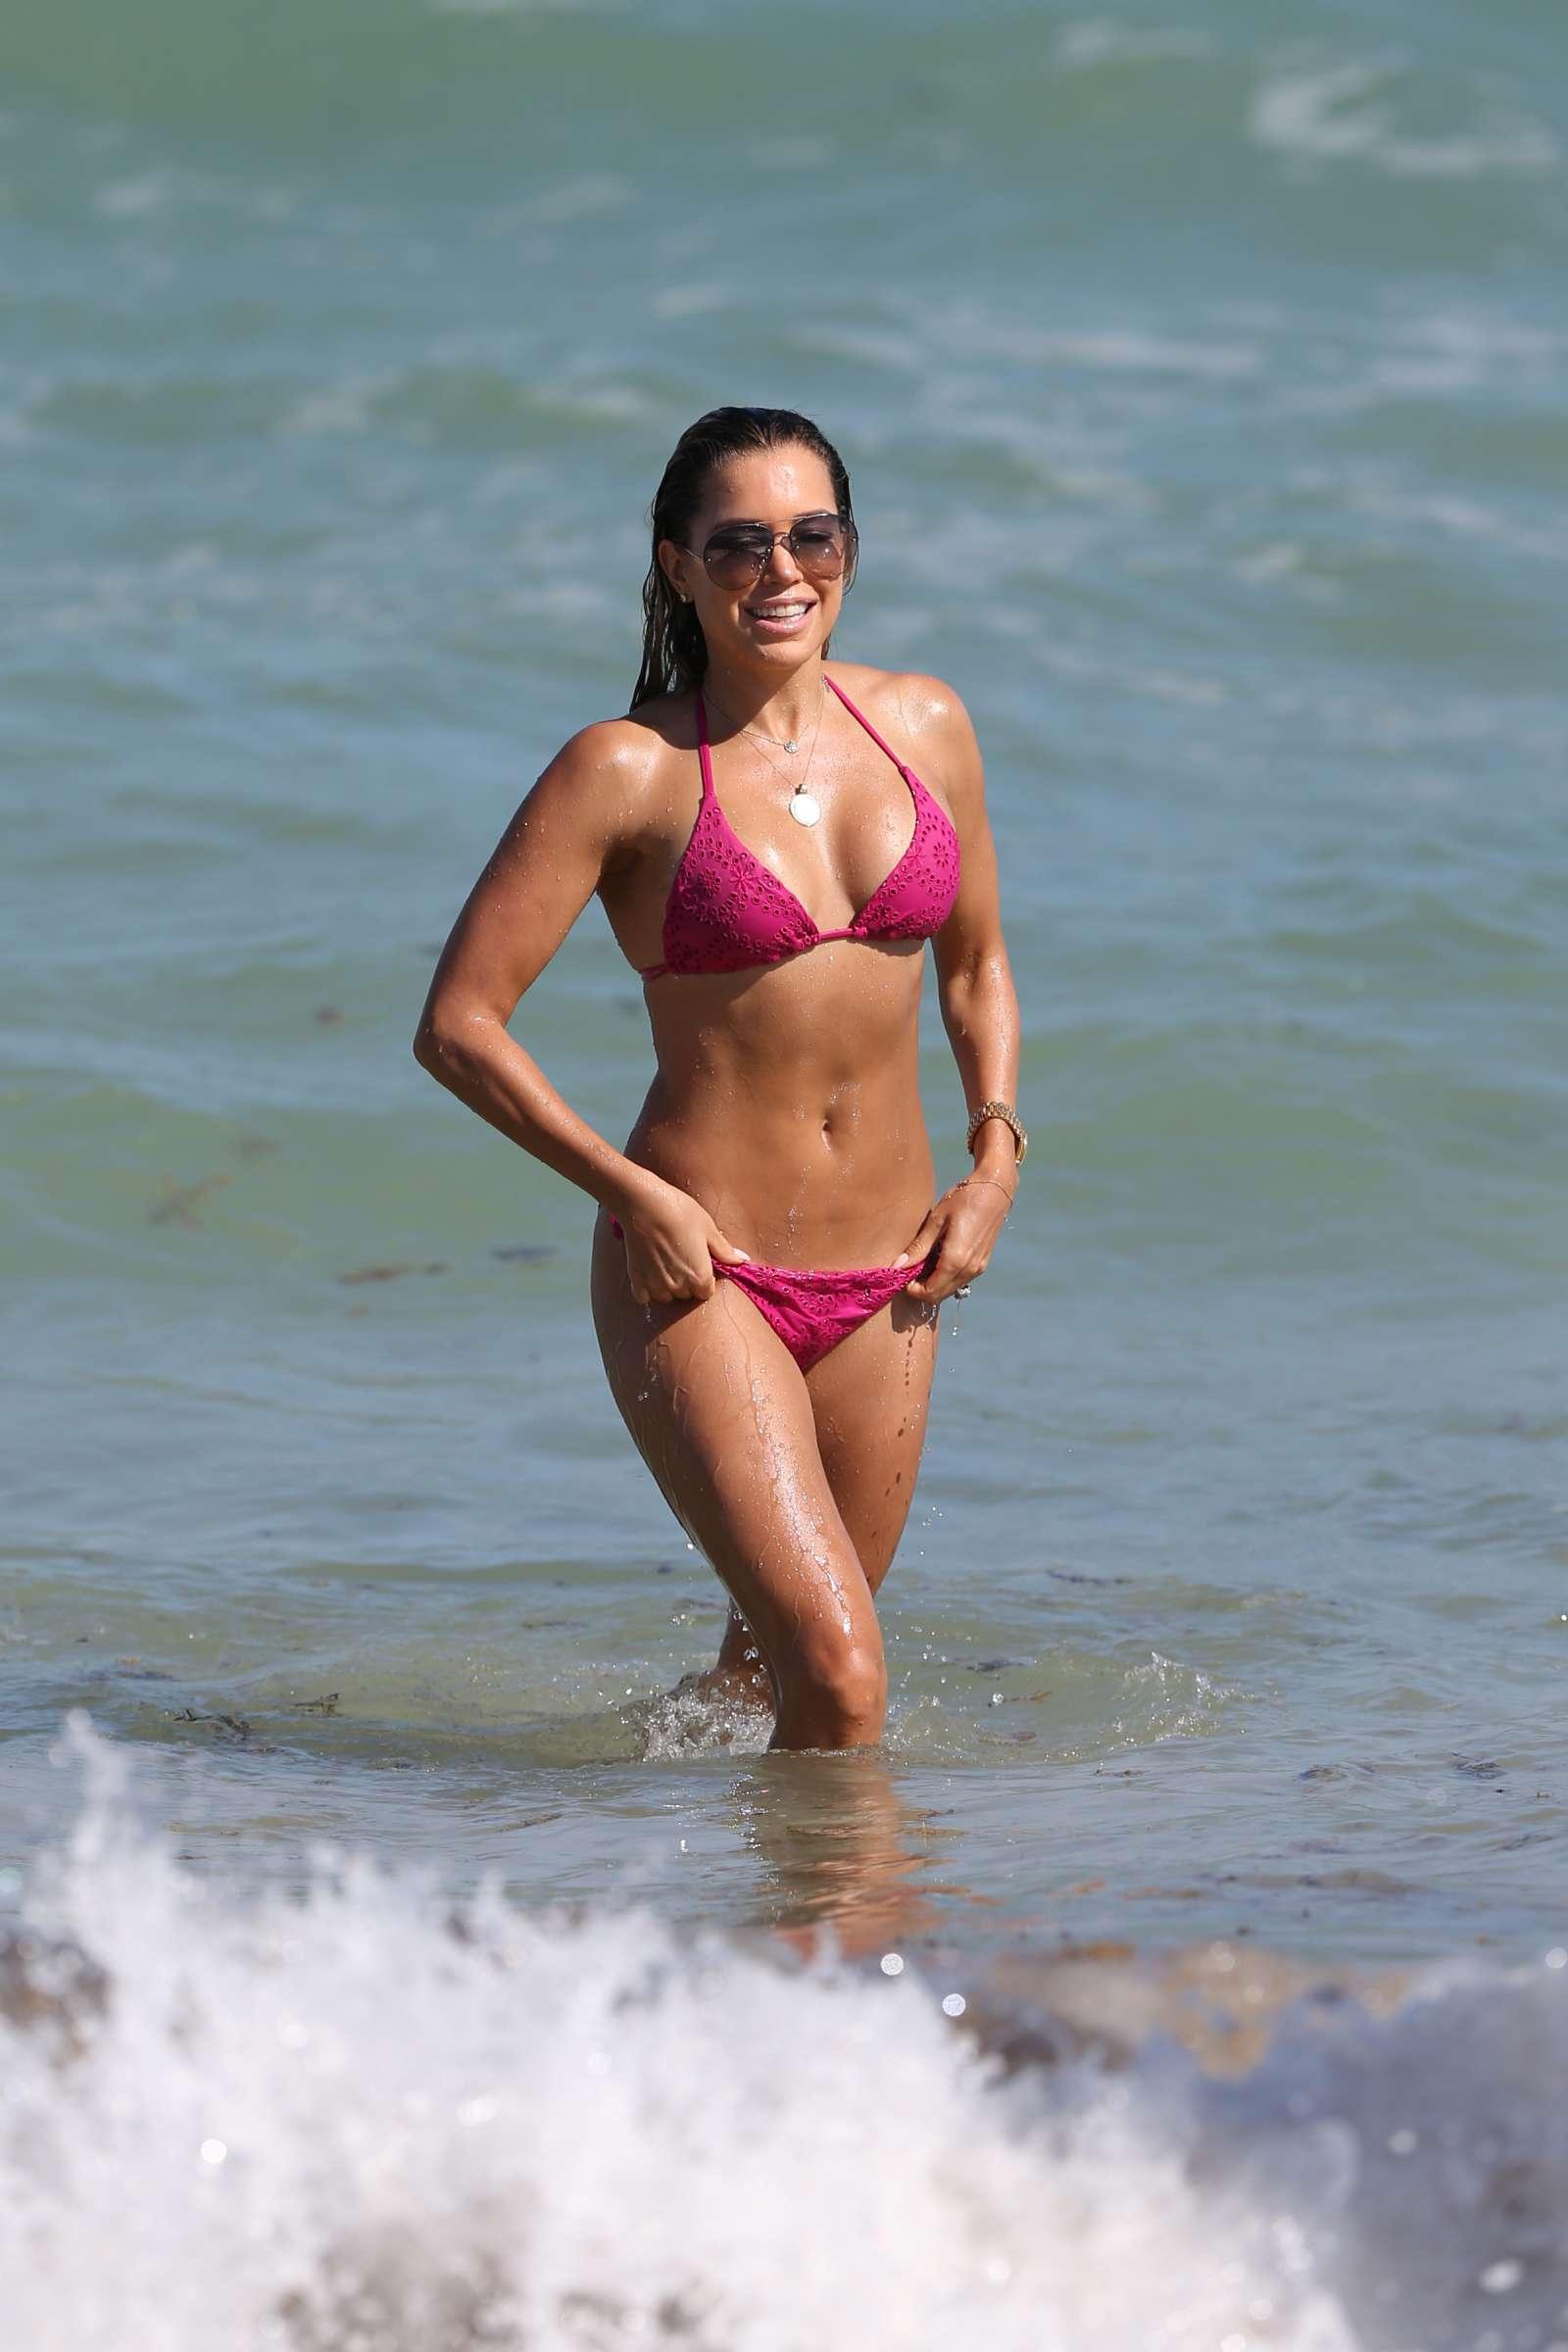 Sylvie Meis 2018 : Sylvie Meis in Pink Bikini 2018 -14